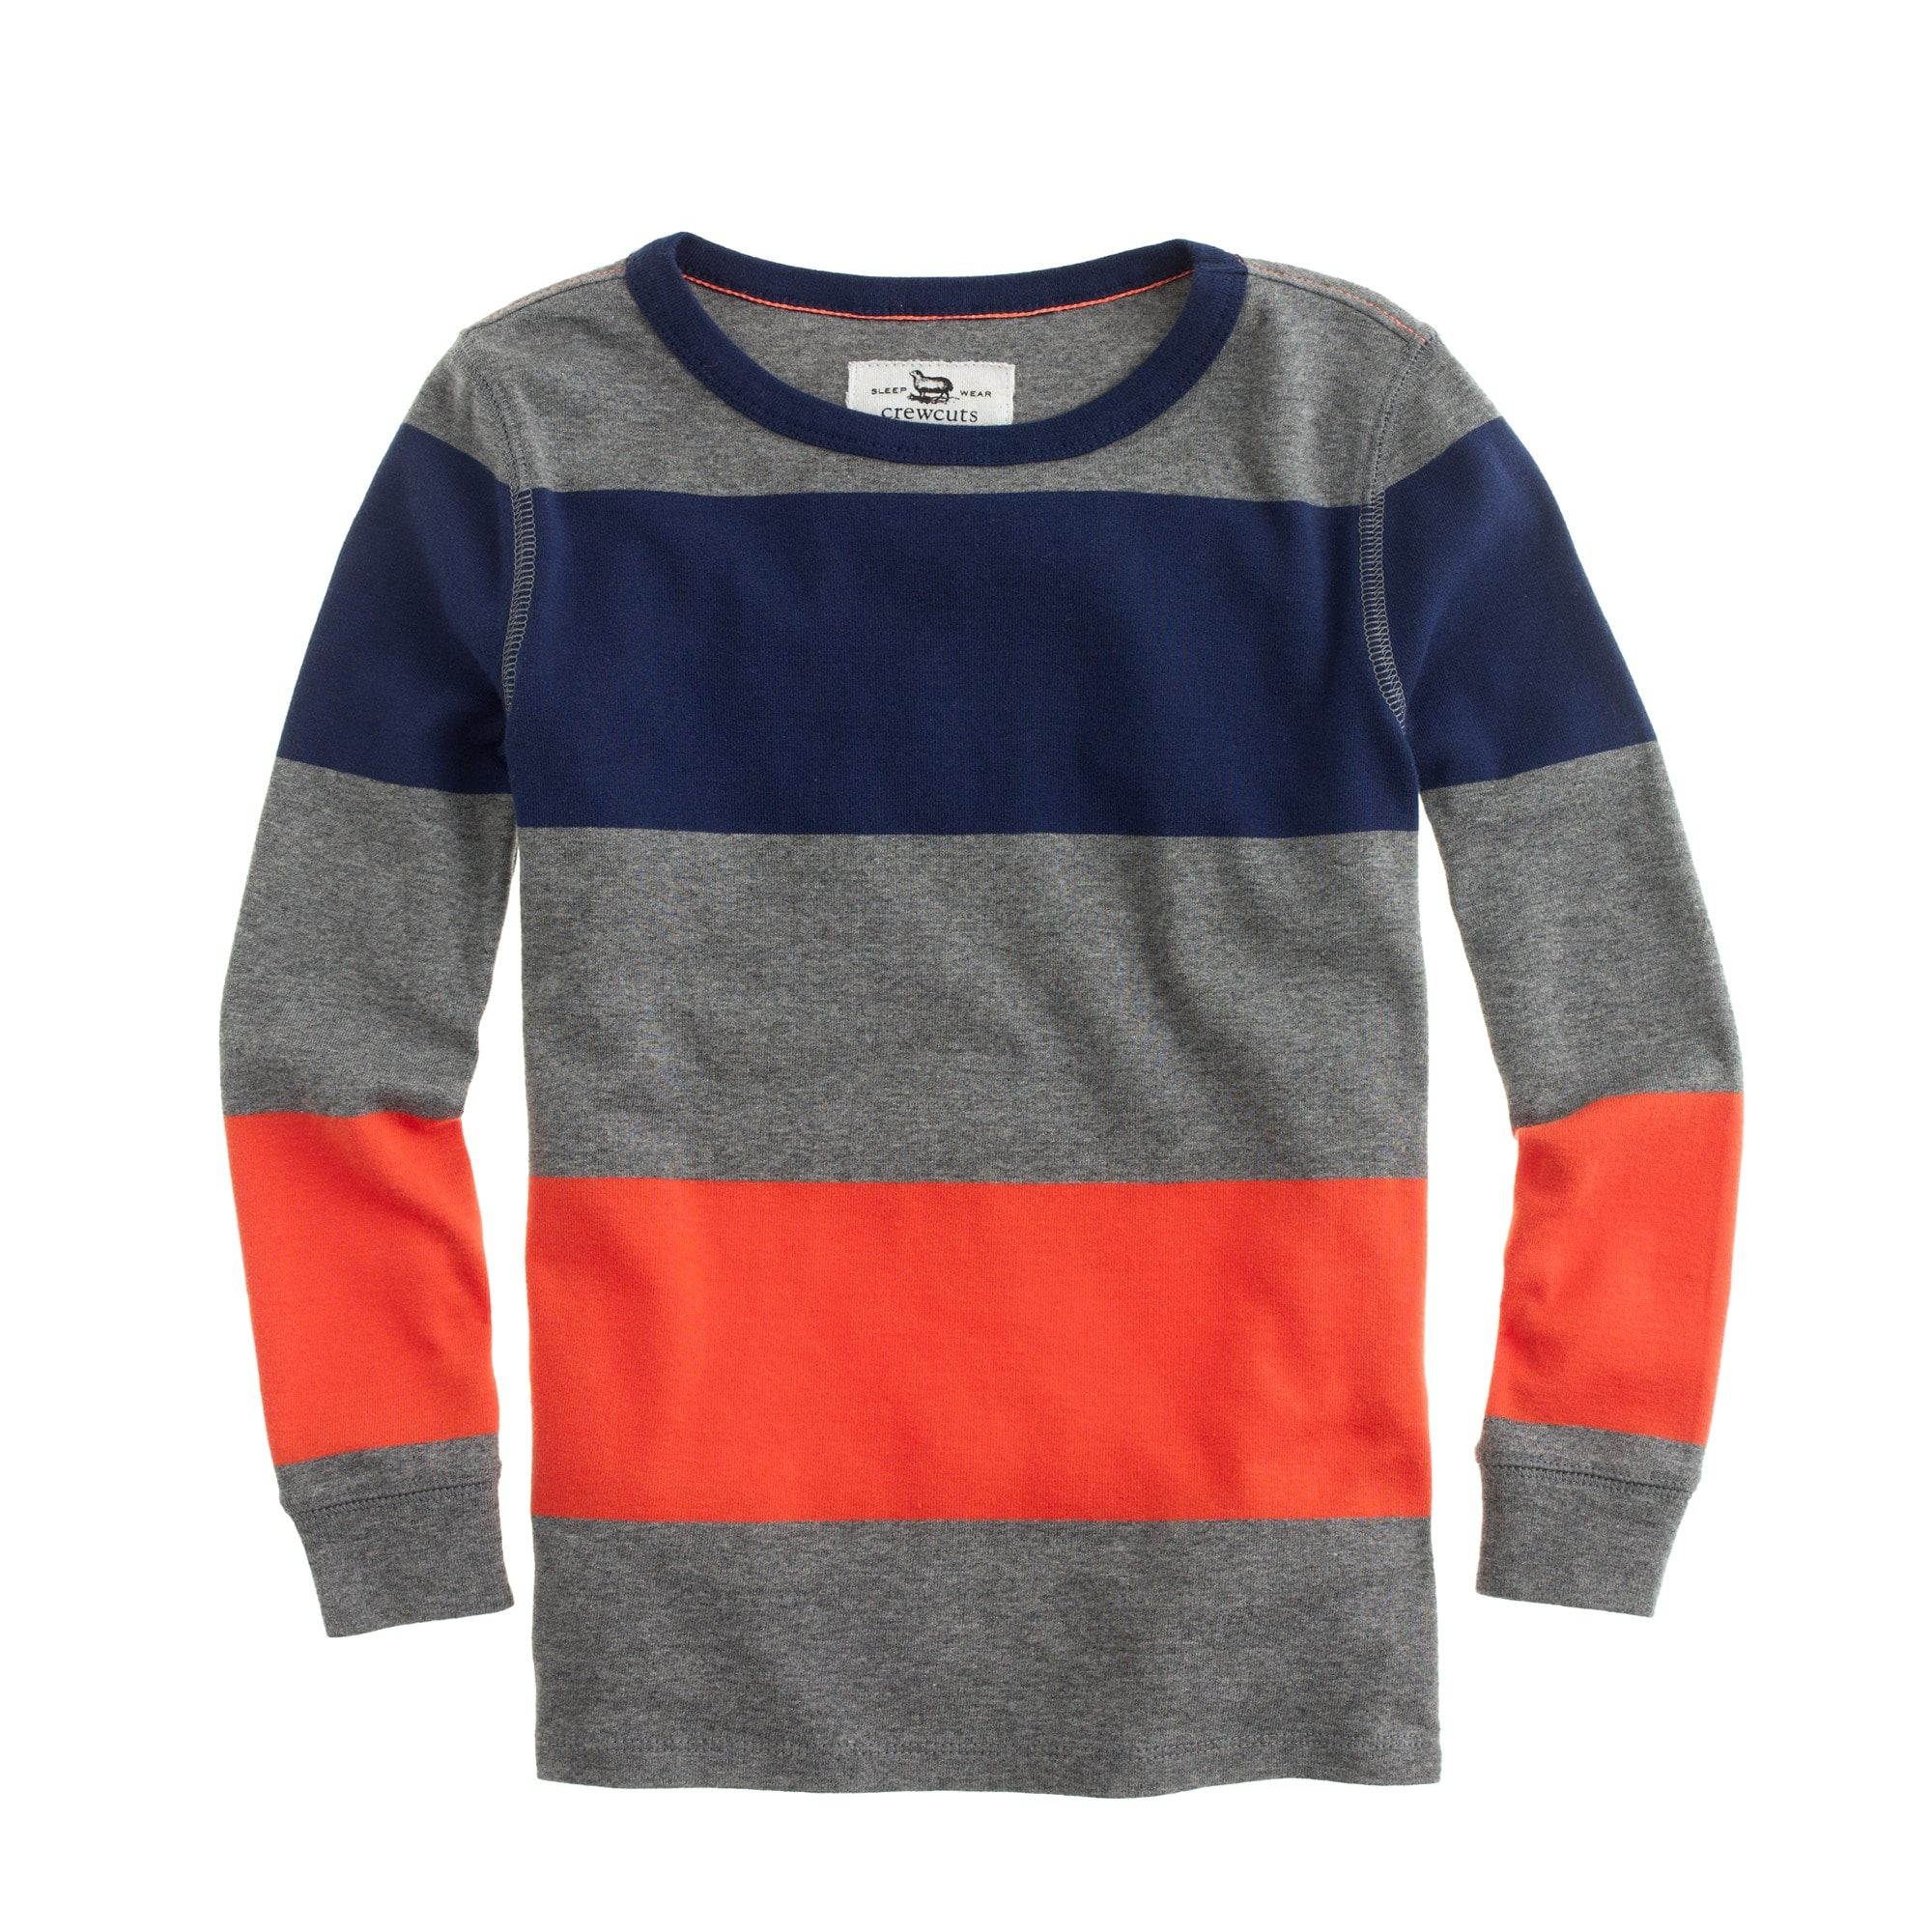 Boys' pajama set in flannel stripe